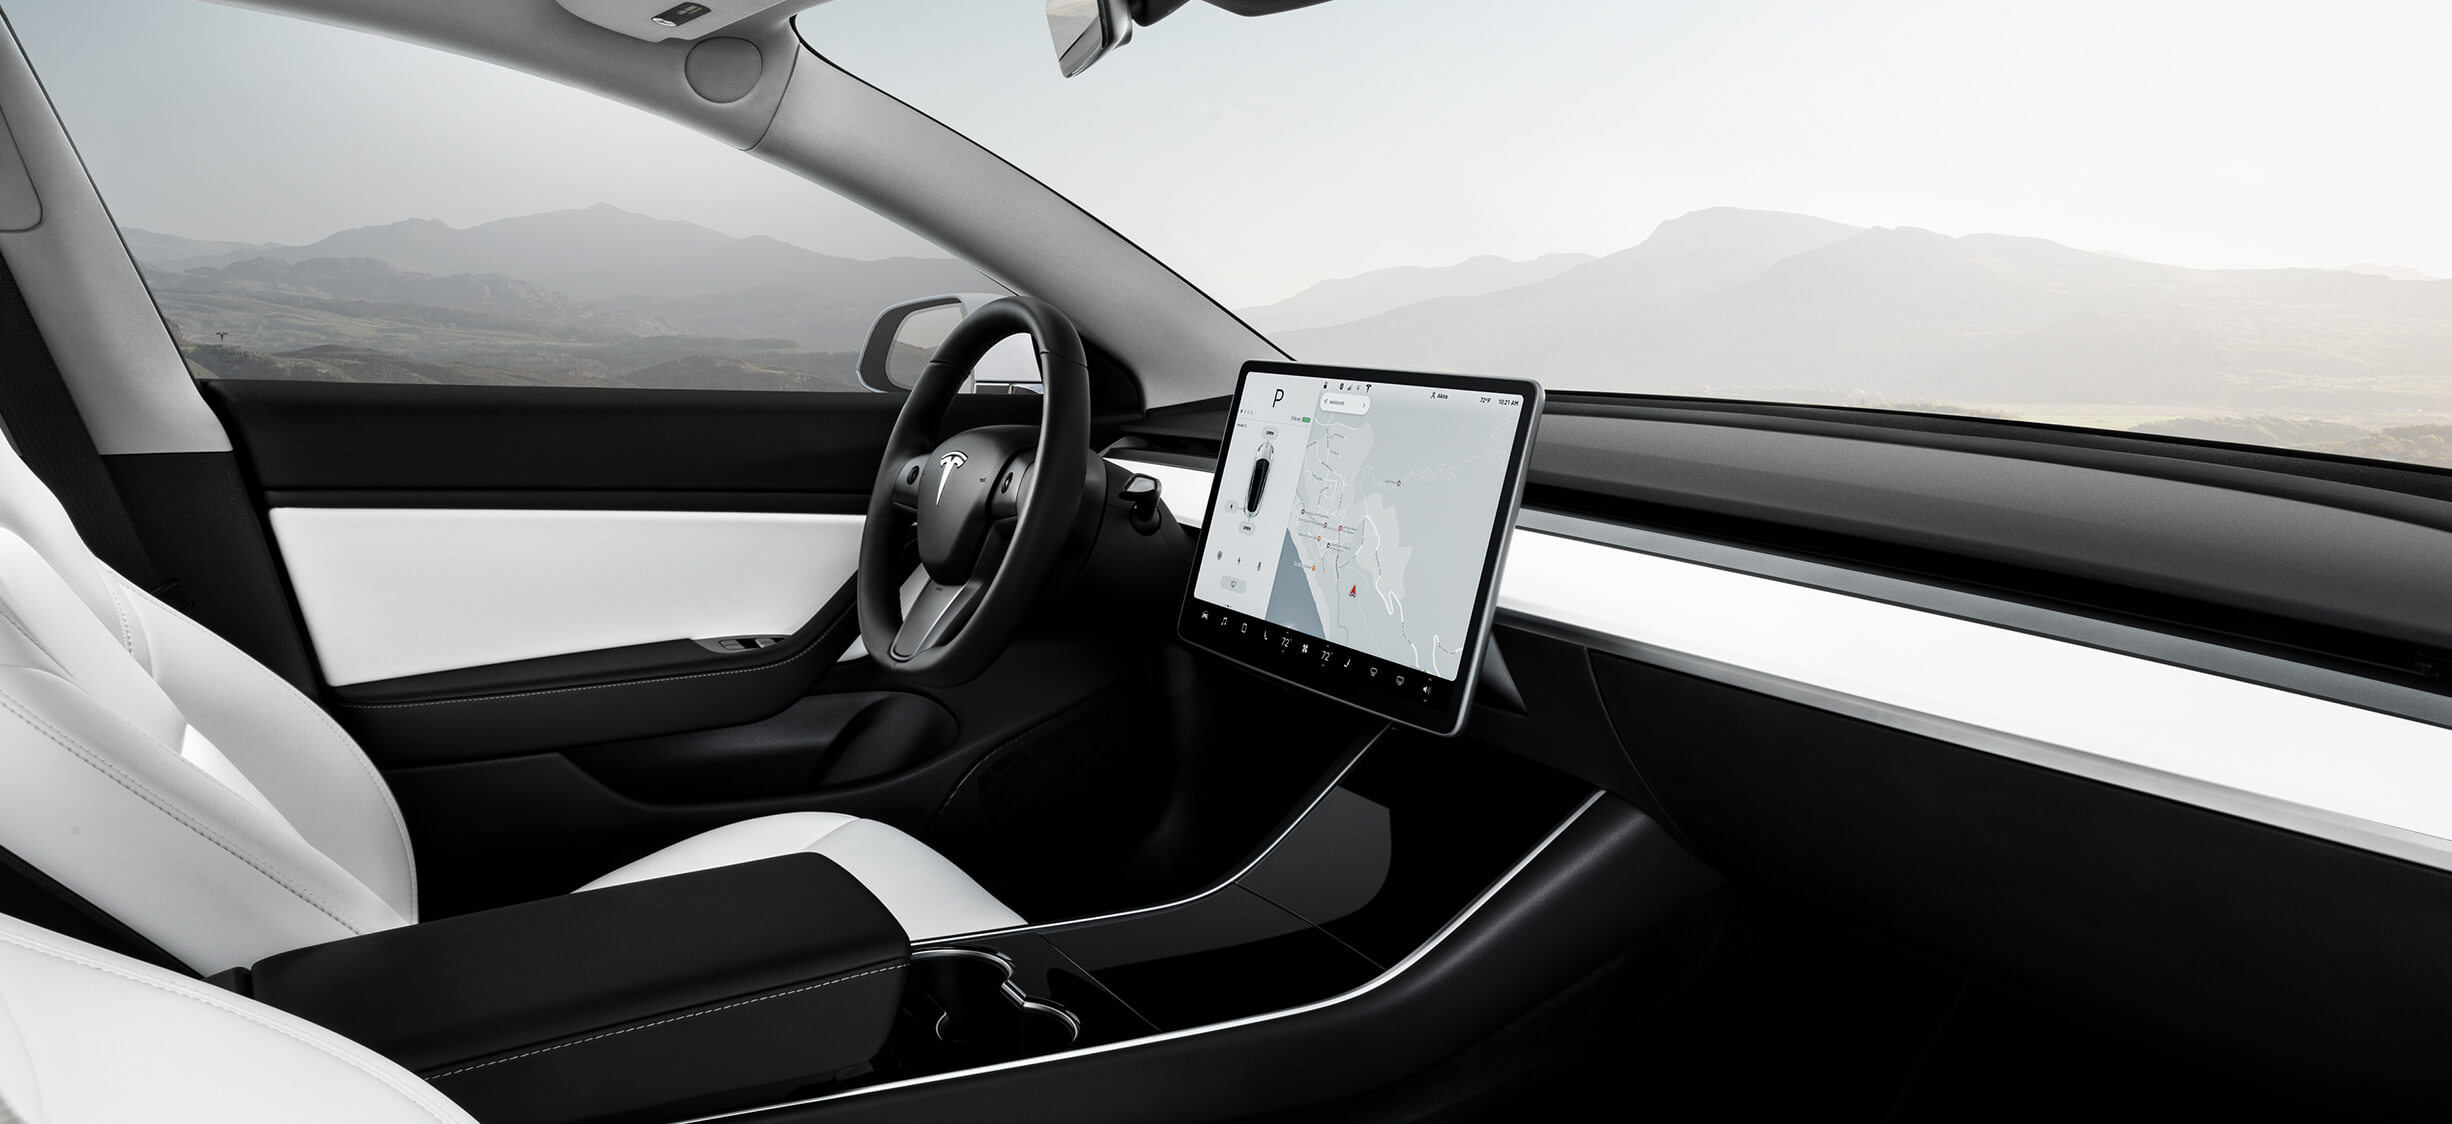 Tesla improves regenerative braking on Model 3 through over-the-air software update